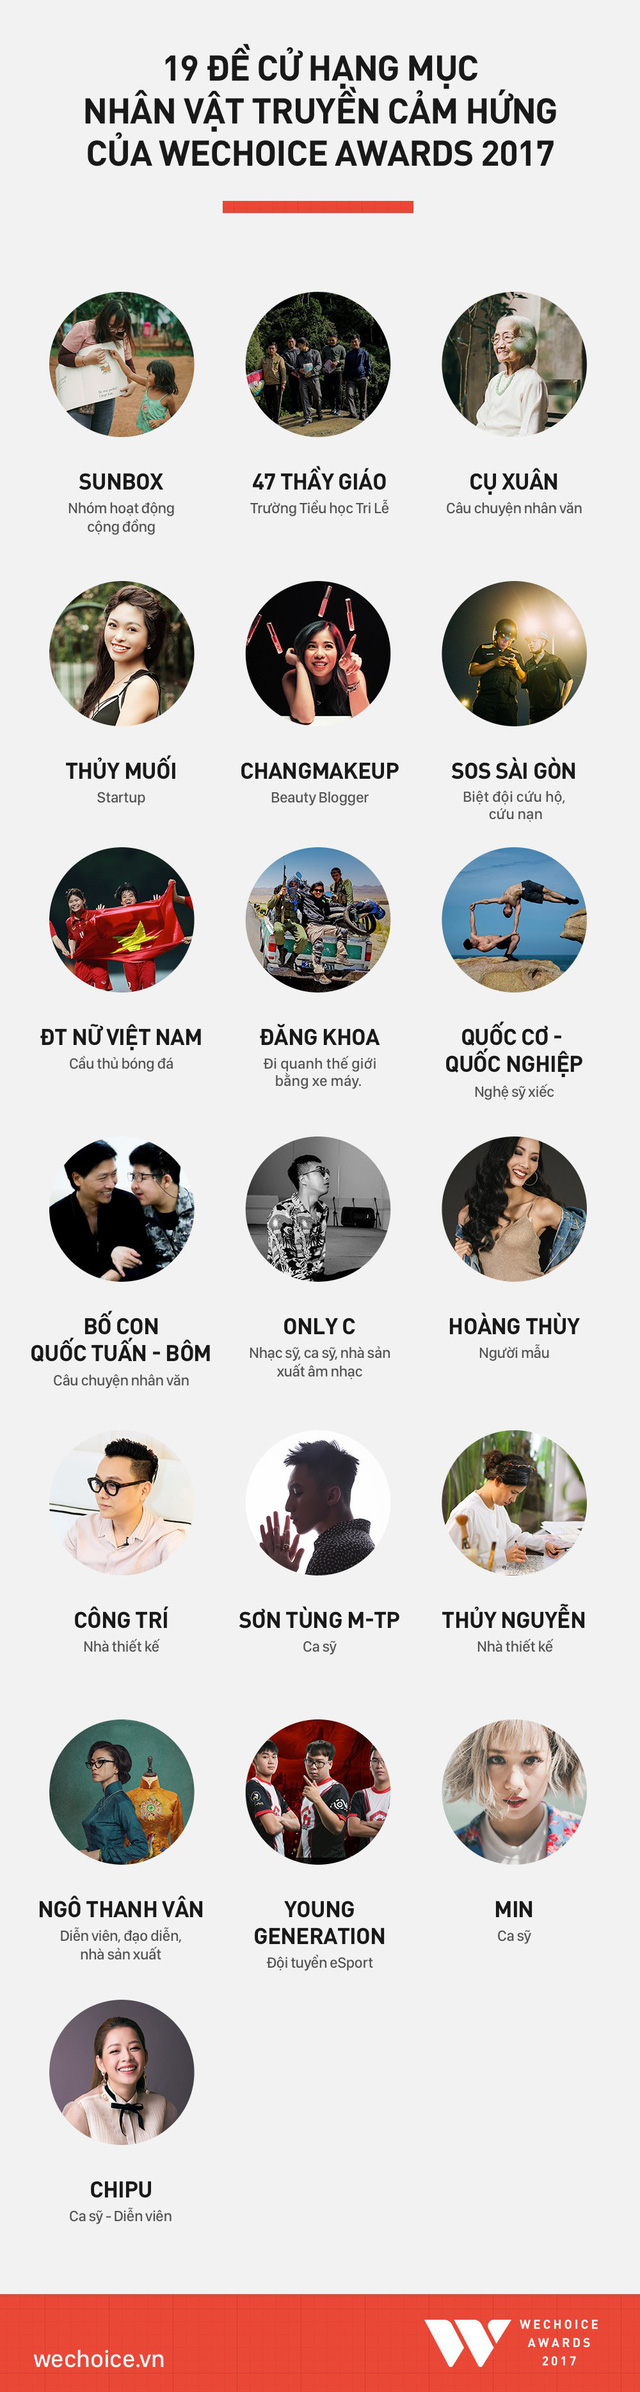 19 nhân vật truyền cảm hứng tại WeChoice Awards 2017 là ai? - Ảnh 1.